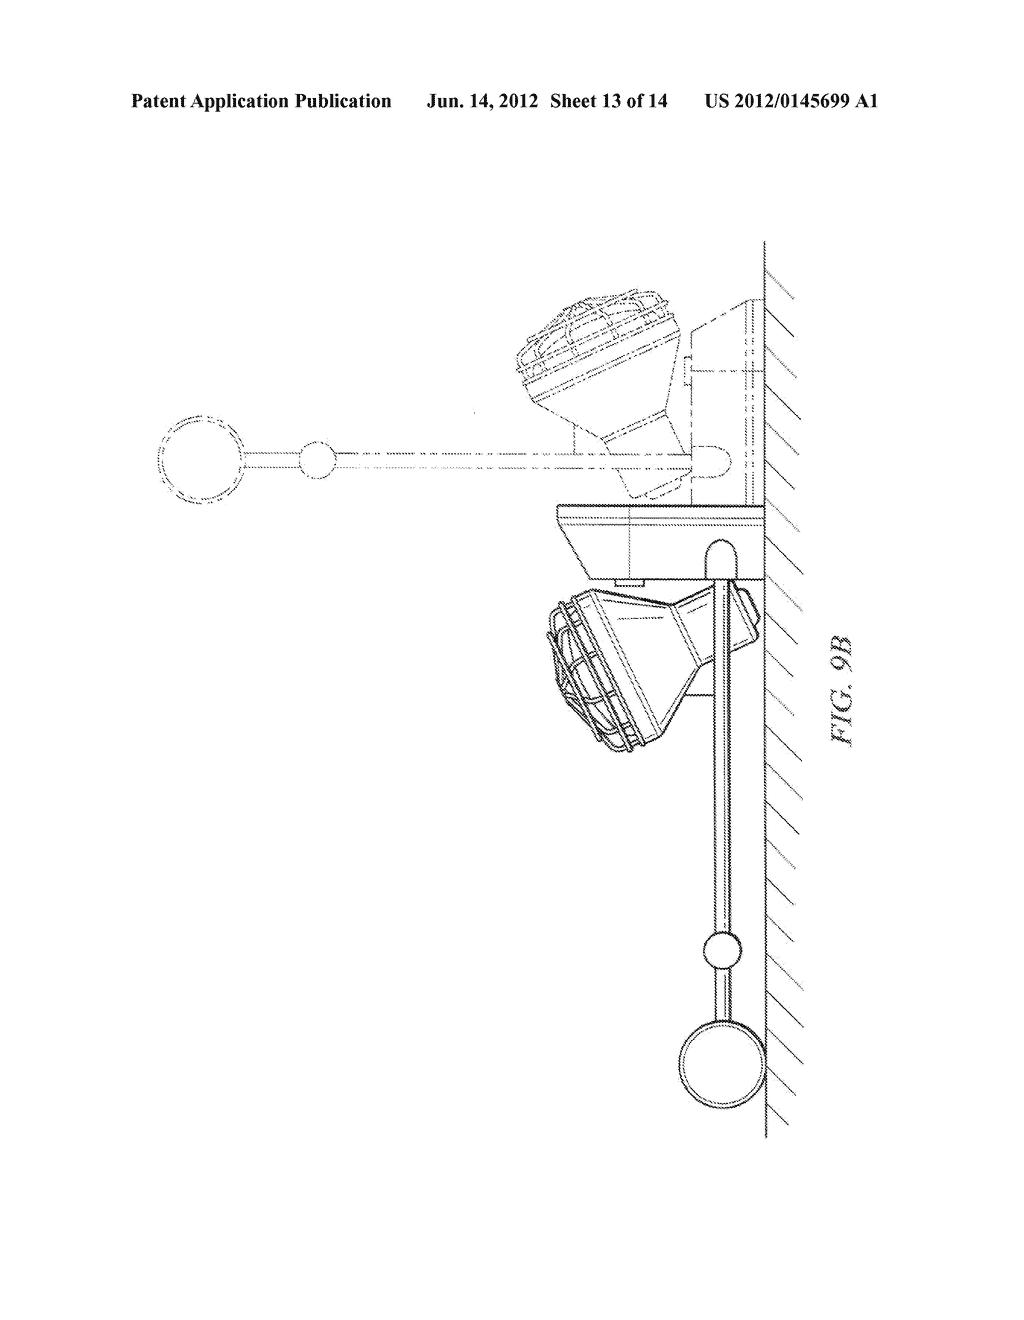 Heat Lamp Diagram, Schematic, And Image 14 Heat Lamp Light Heat Lamp Diagram